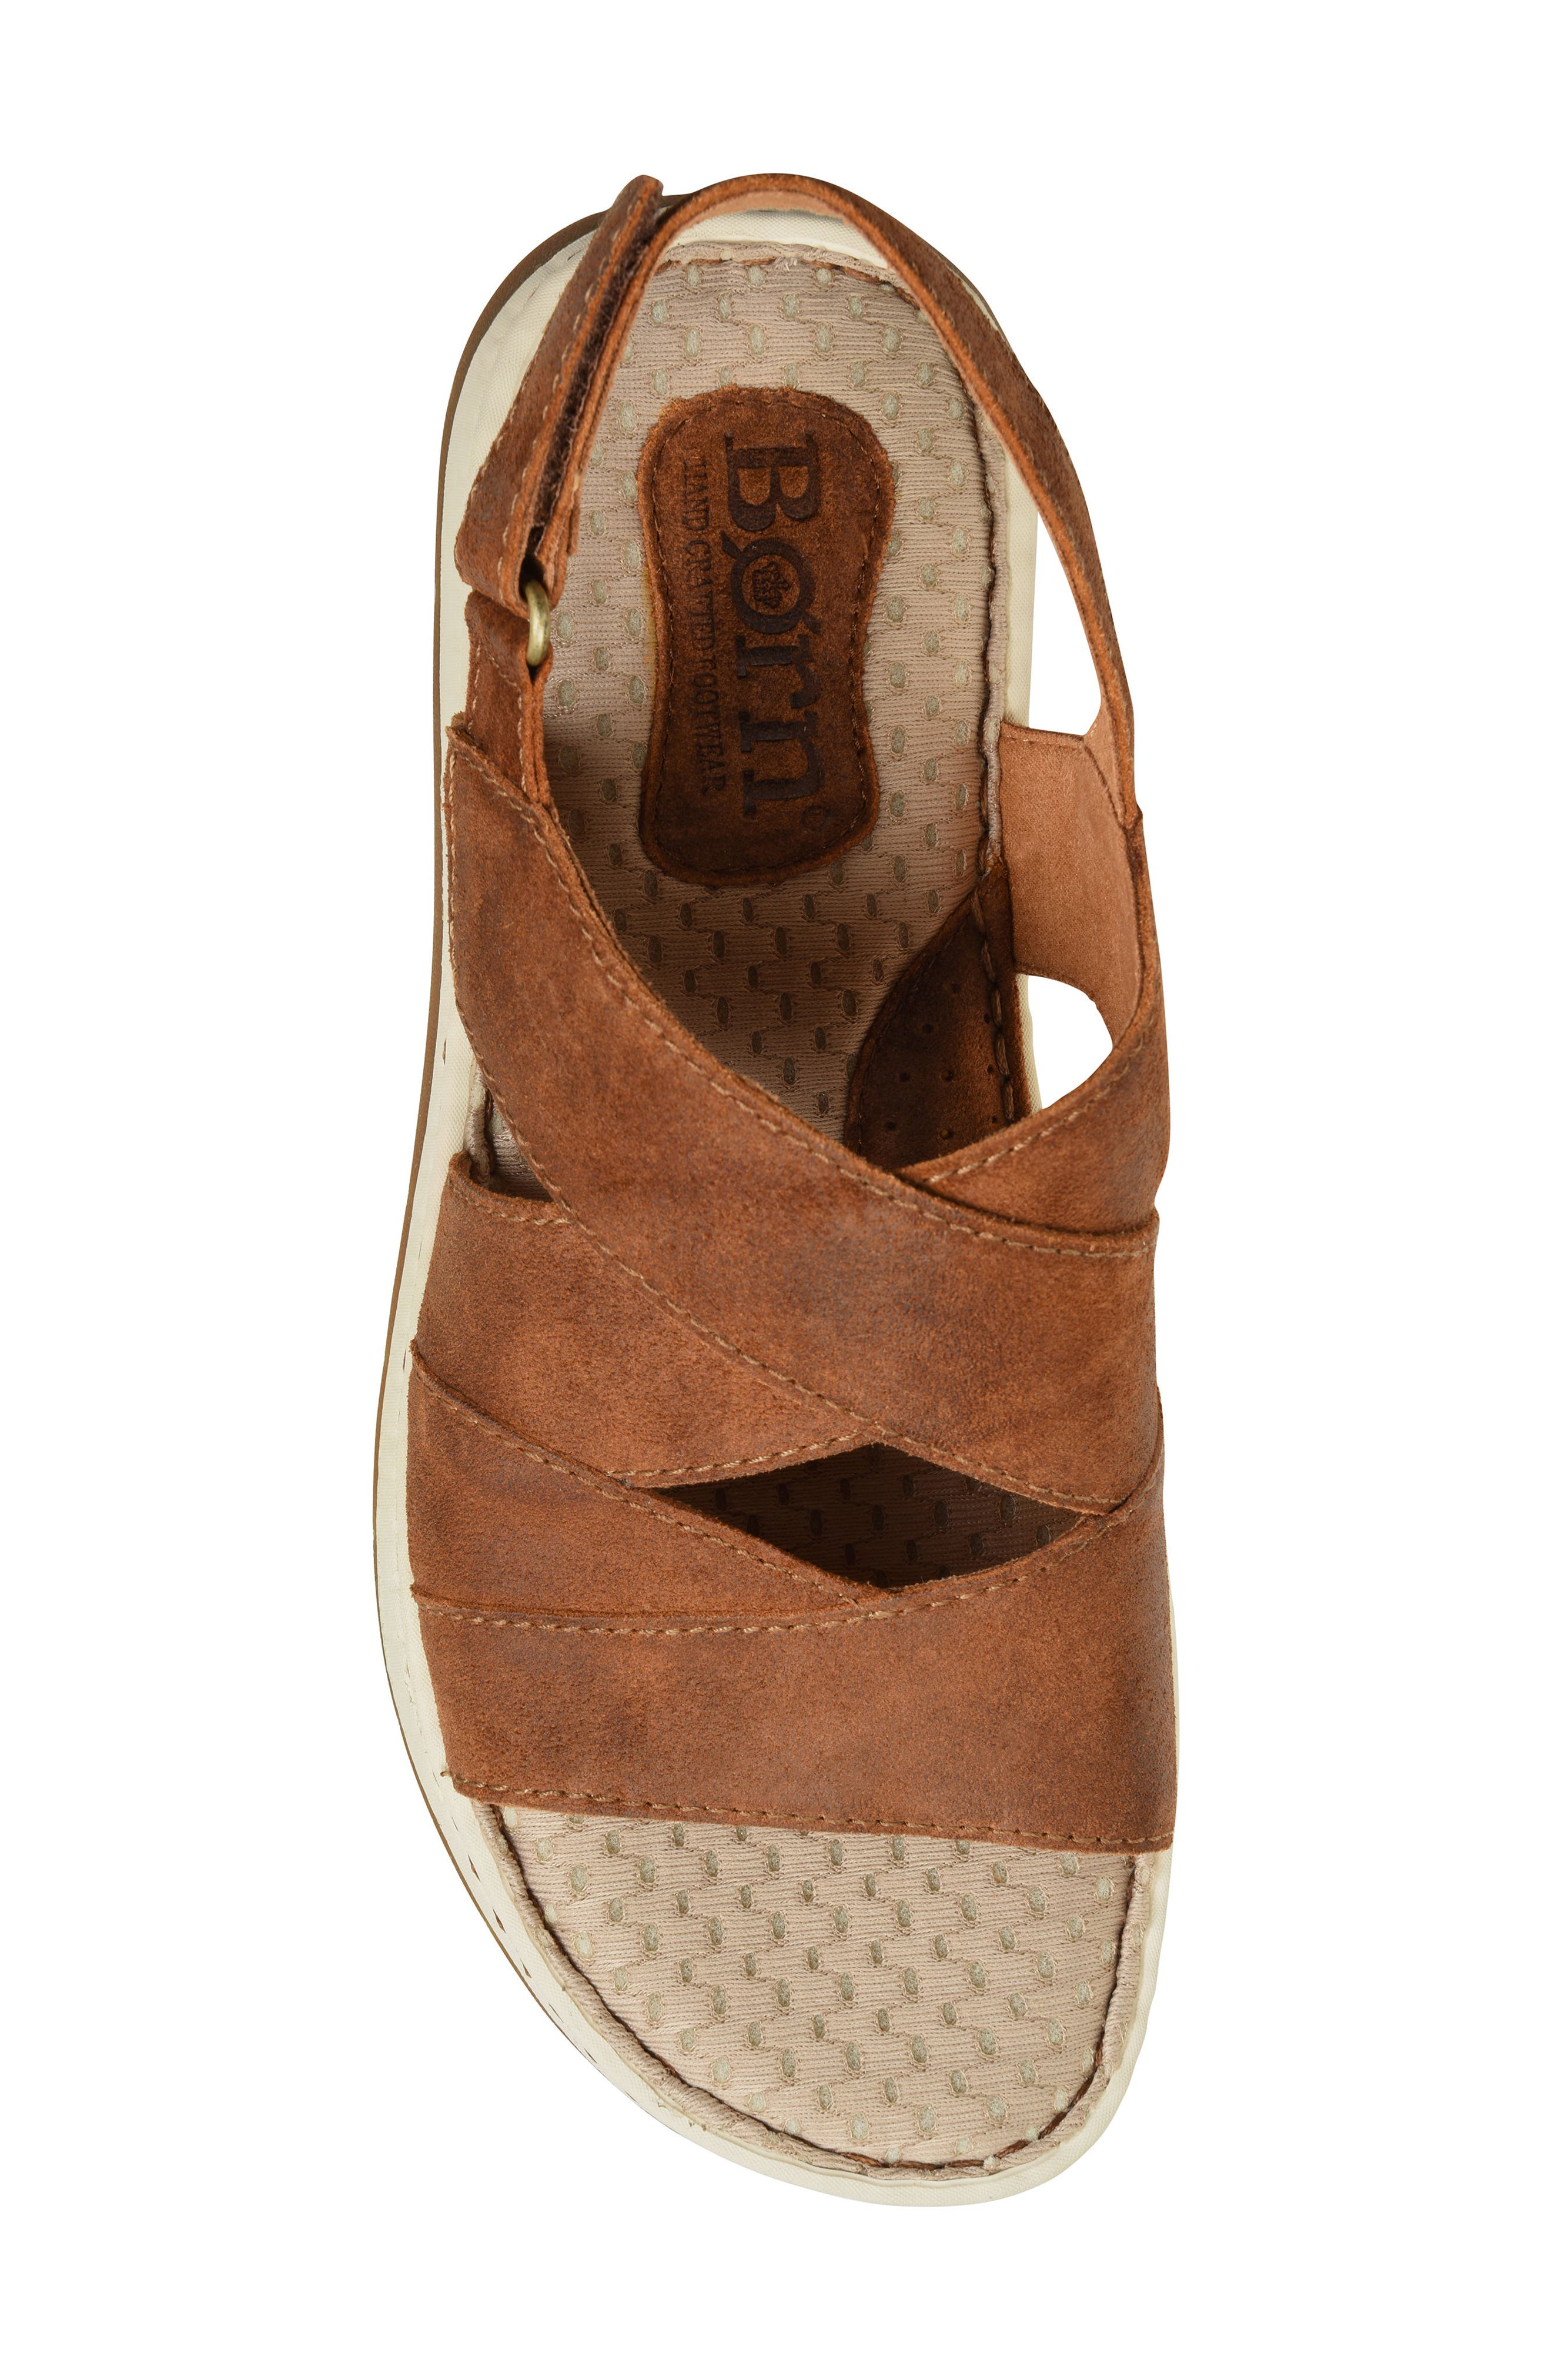 Shell Cross Strap Sandal,                             Alternate thumbnail 5, color,                             Rust Leather